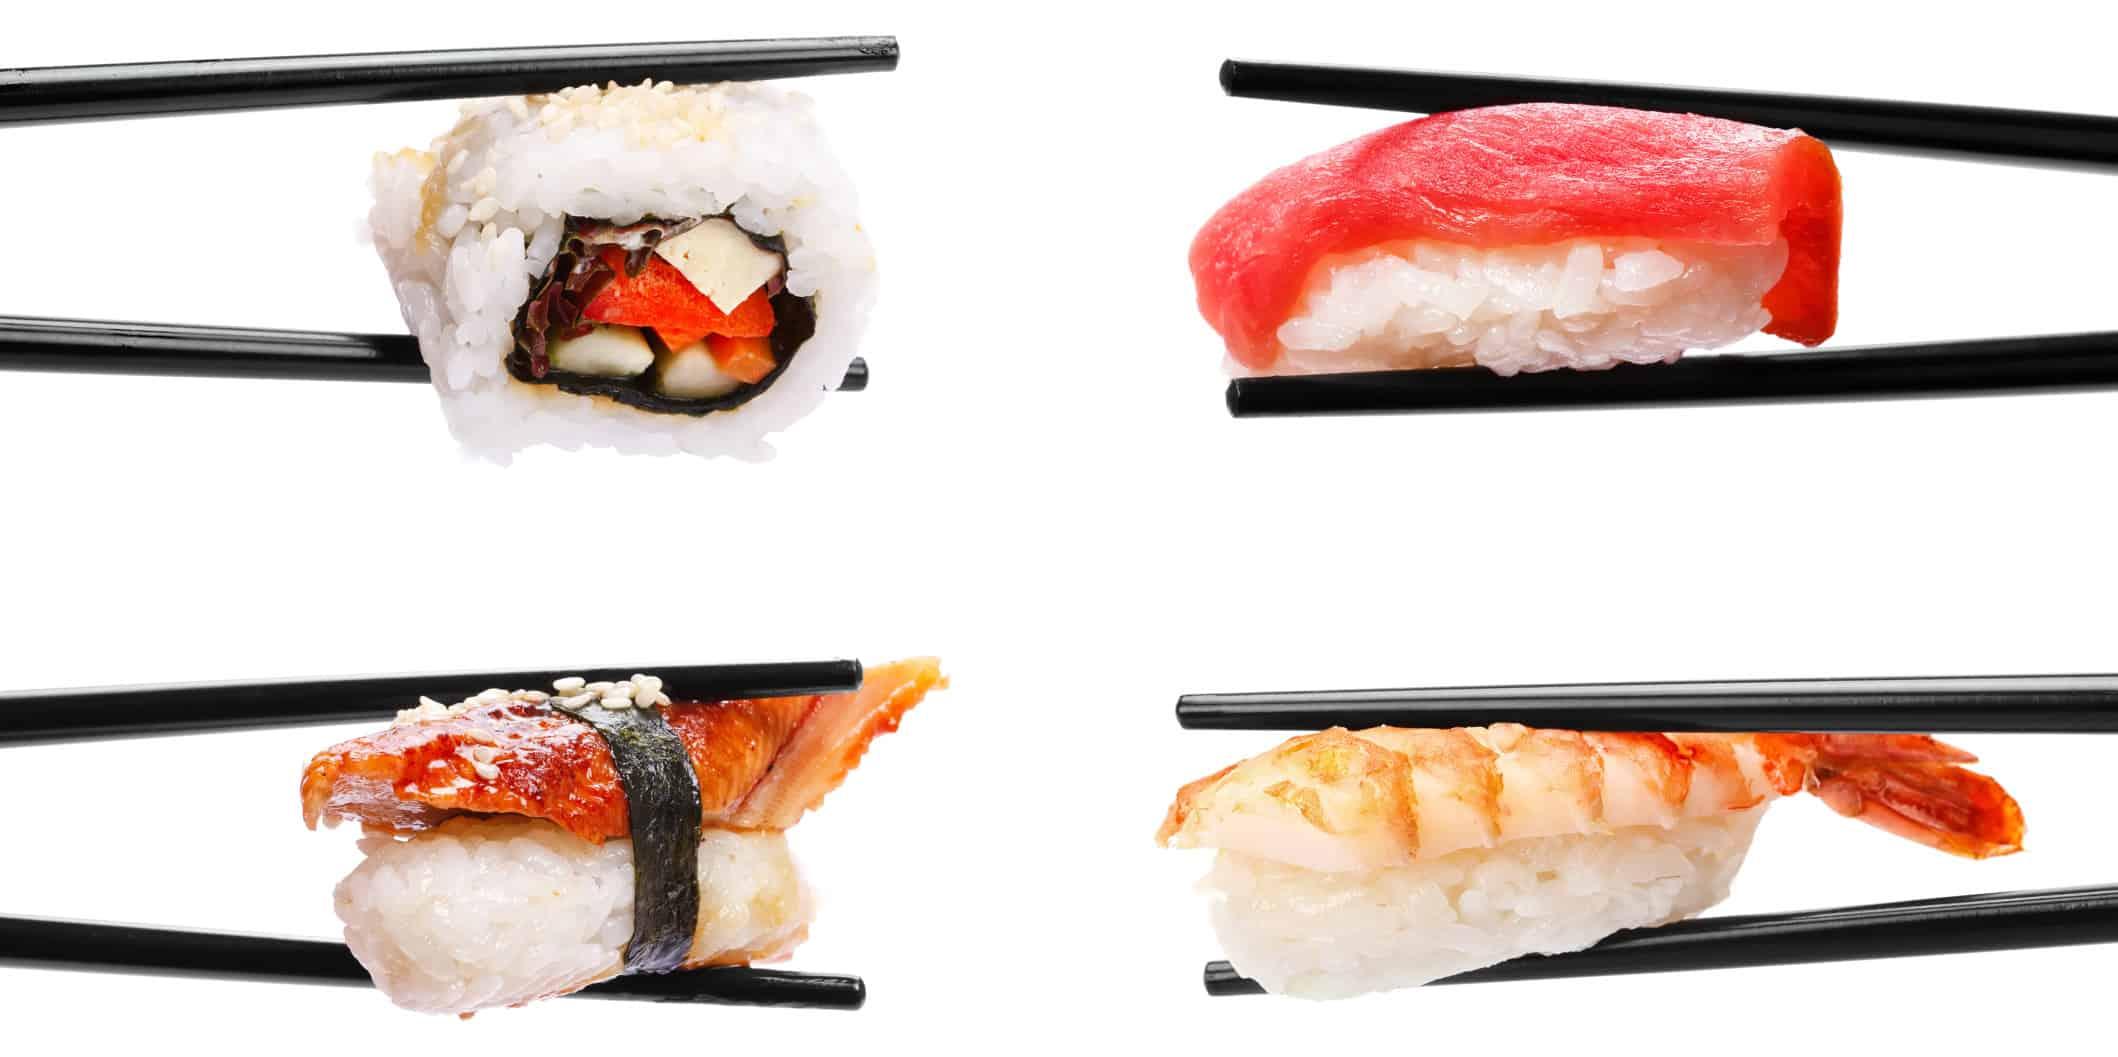 Sushi-Geschmack kombiniert mit weniger Kalorien